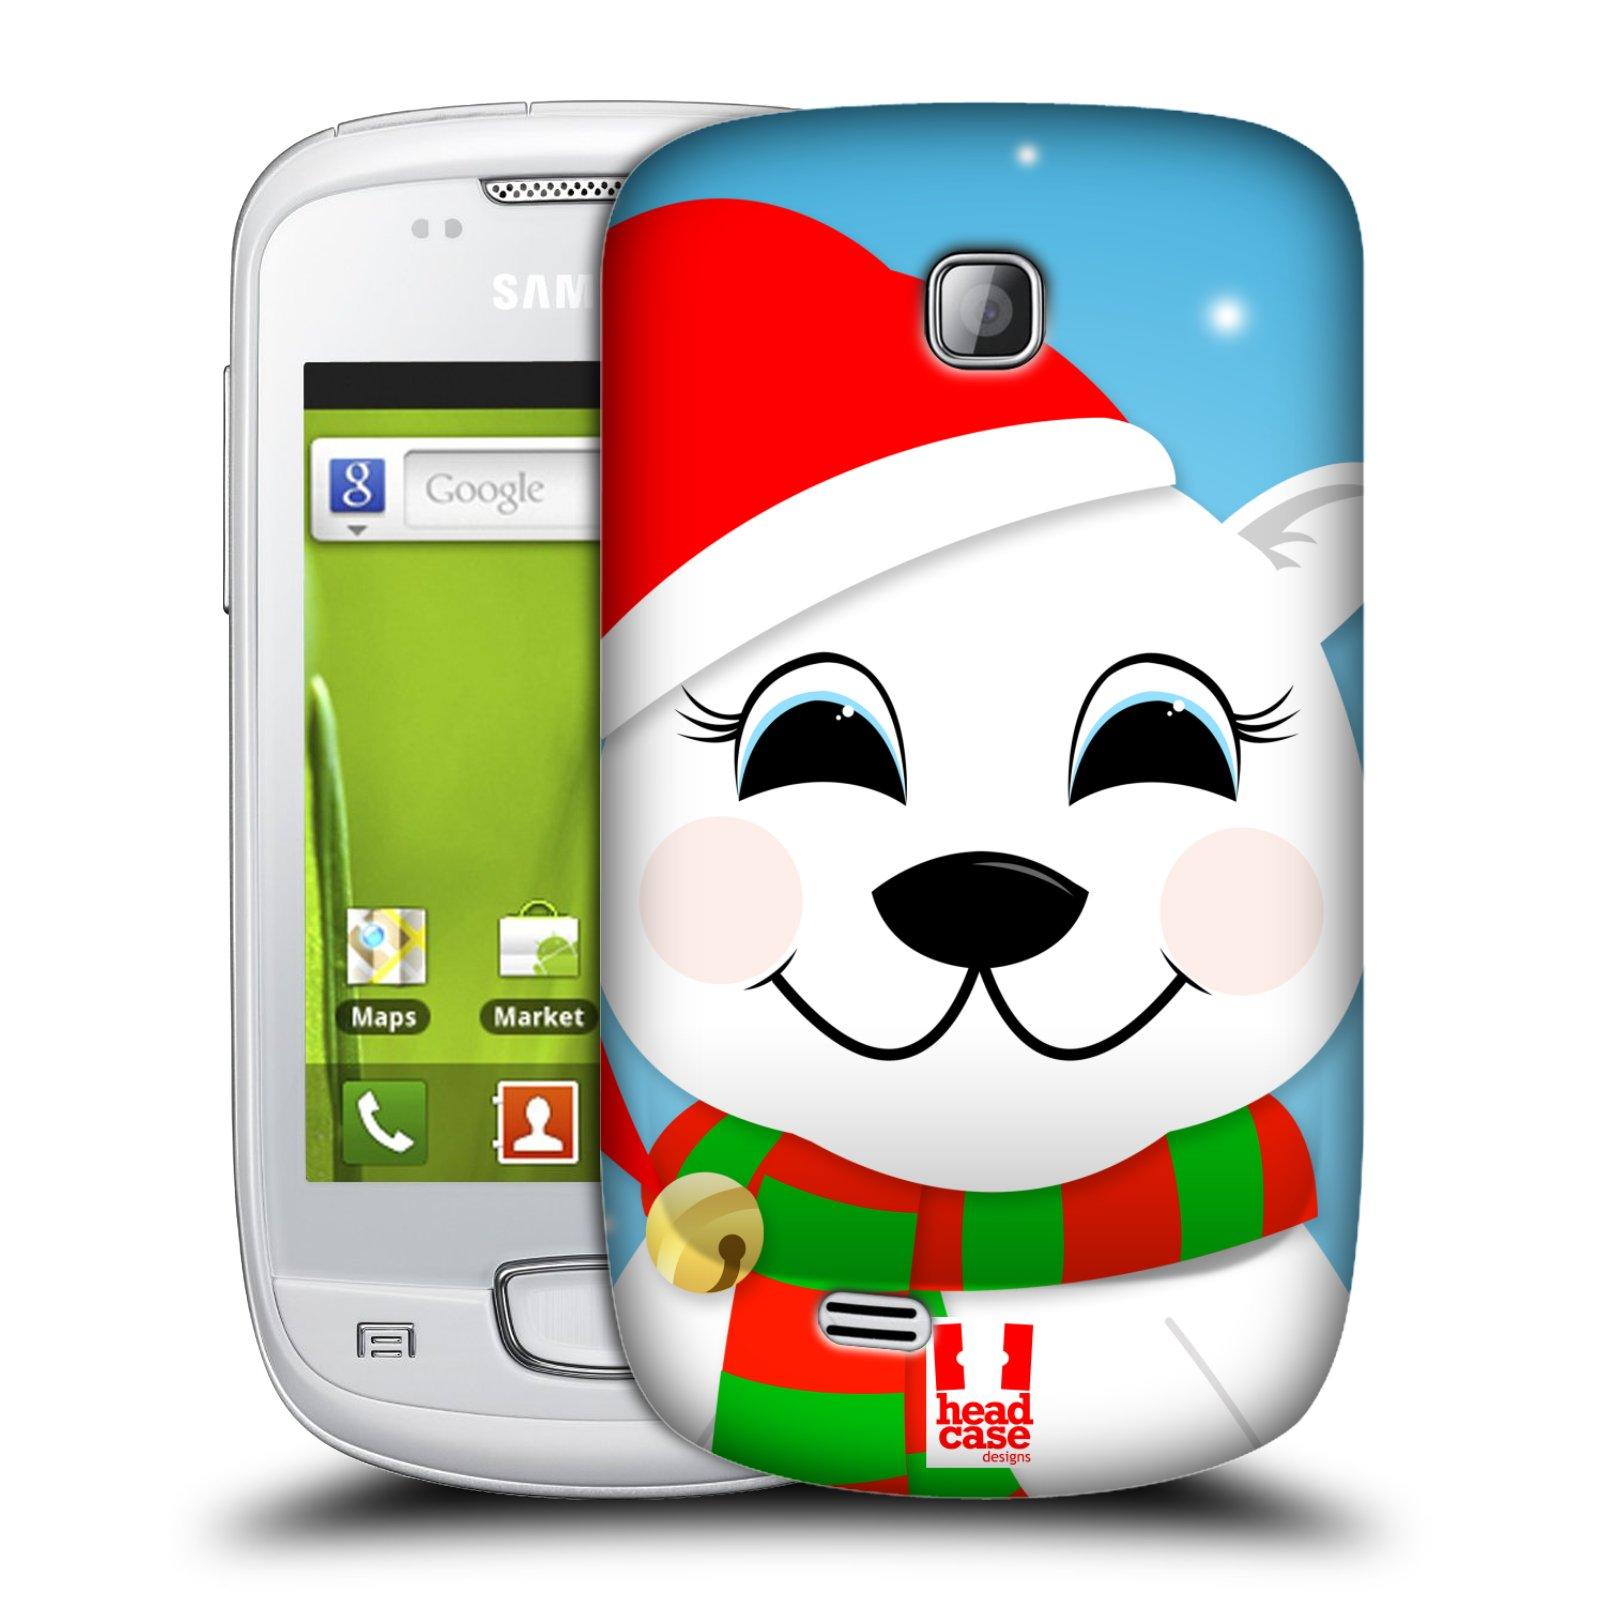 Plastové pouzdro na mobil Samsung Galaxy Mini HEAD CASE VÁNOCE POLÁRNÍ MÉĎA (Kryt či obal na mobilní telefon Samsung Galaxy Mini GT-S5570 / GT-S5570i)